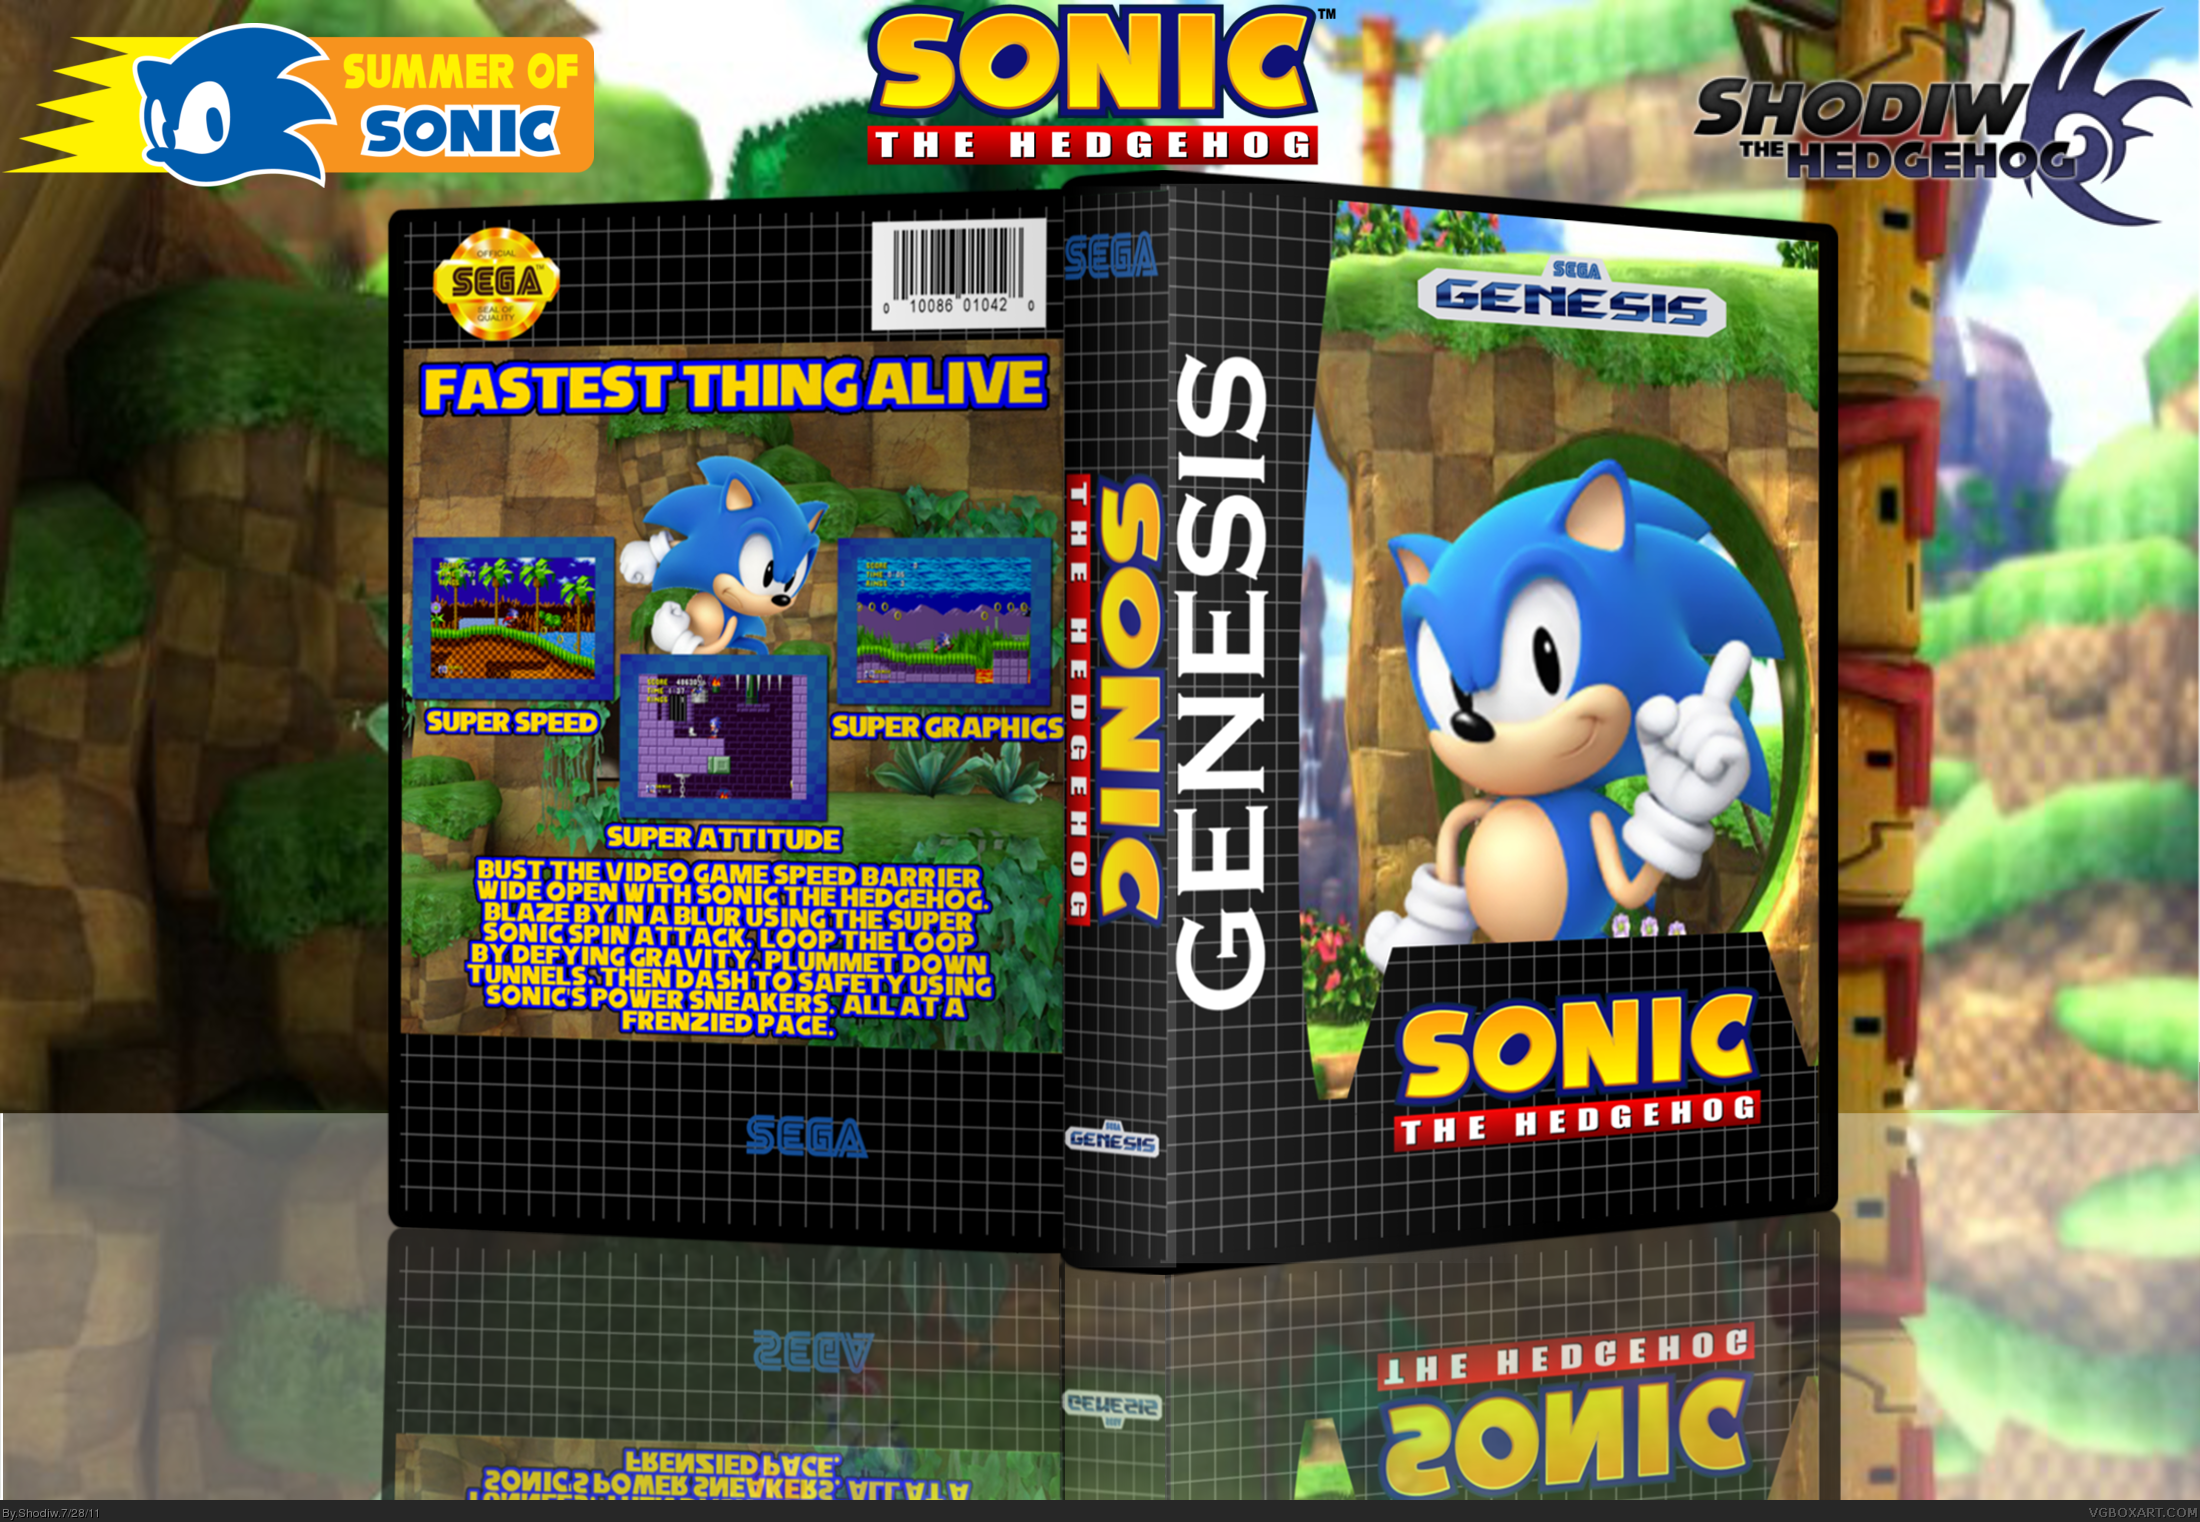 Sonic The Hedgehog Genesis Box Art Cover By Shodiw